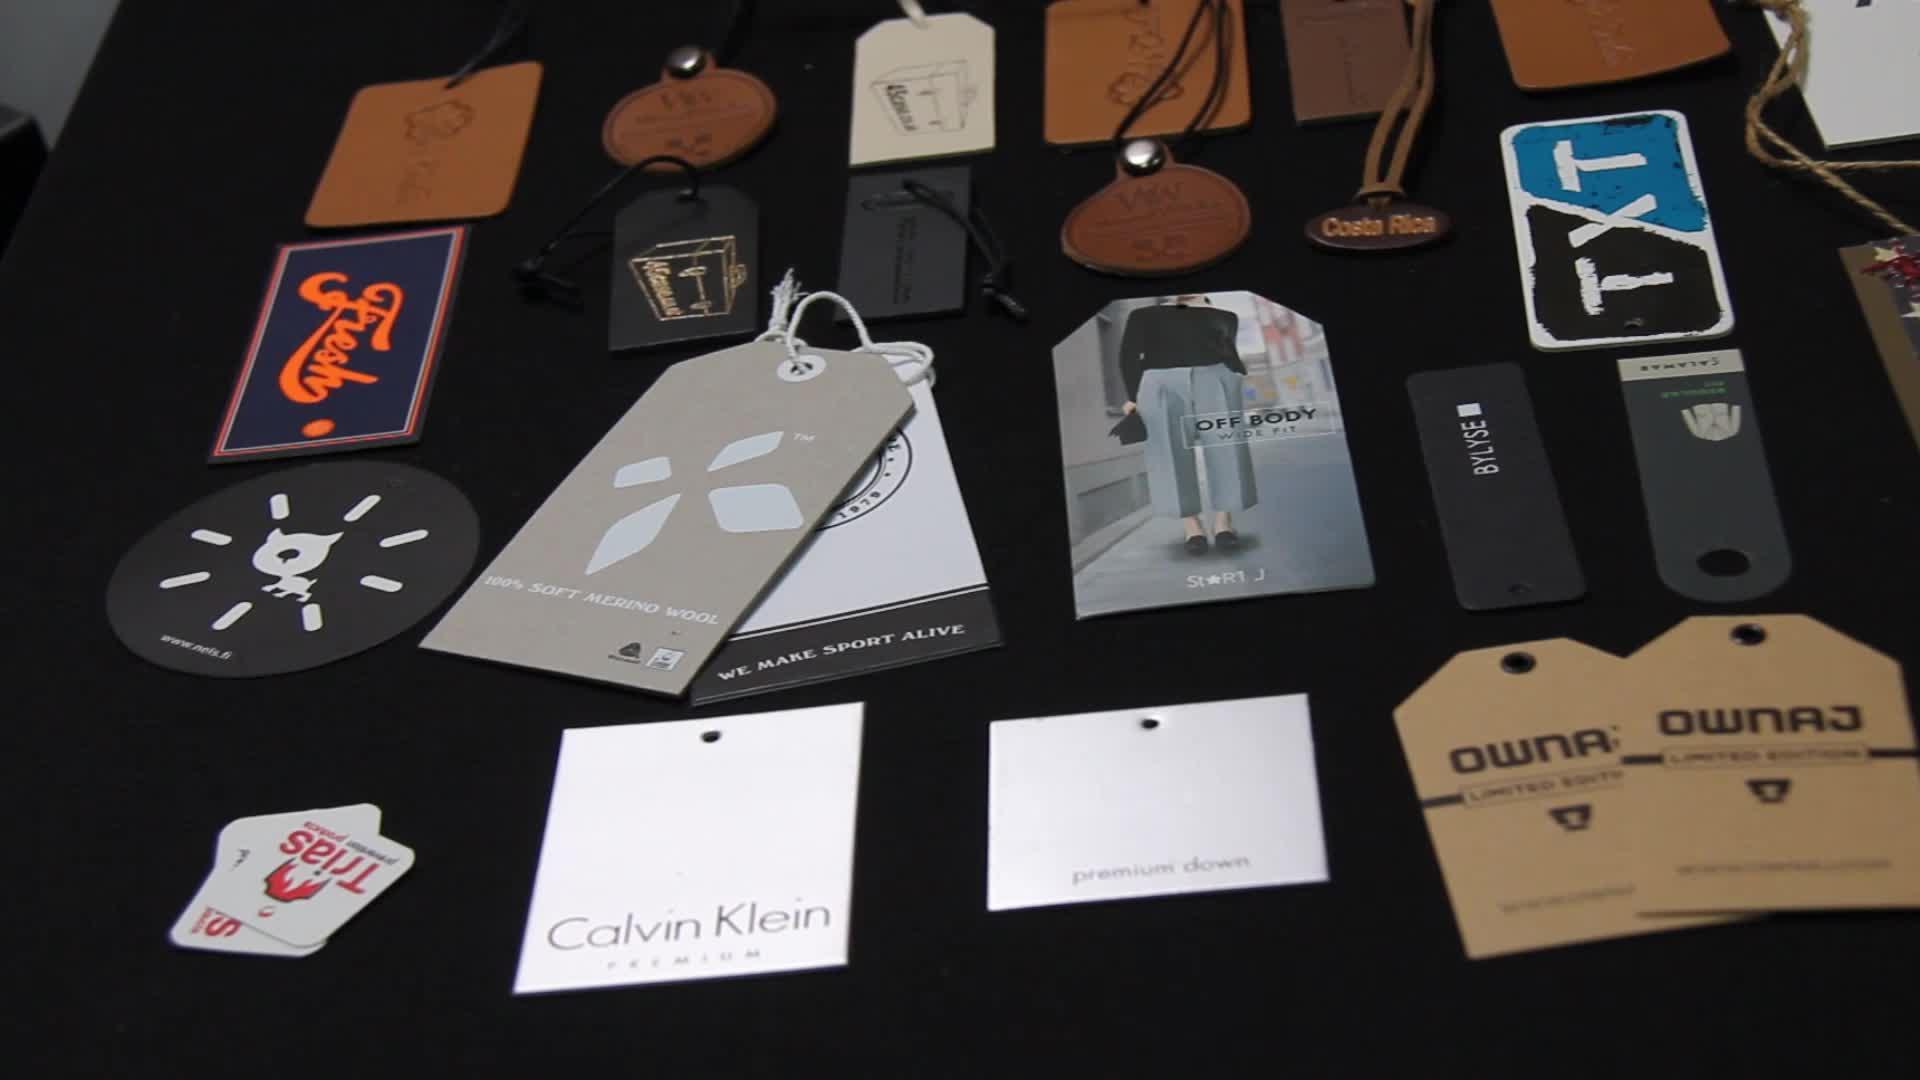 custom garment apparel accessories dress label & paper hang tag